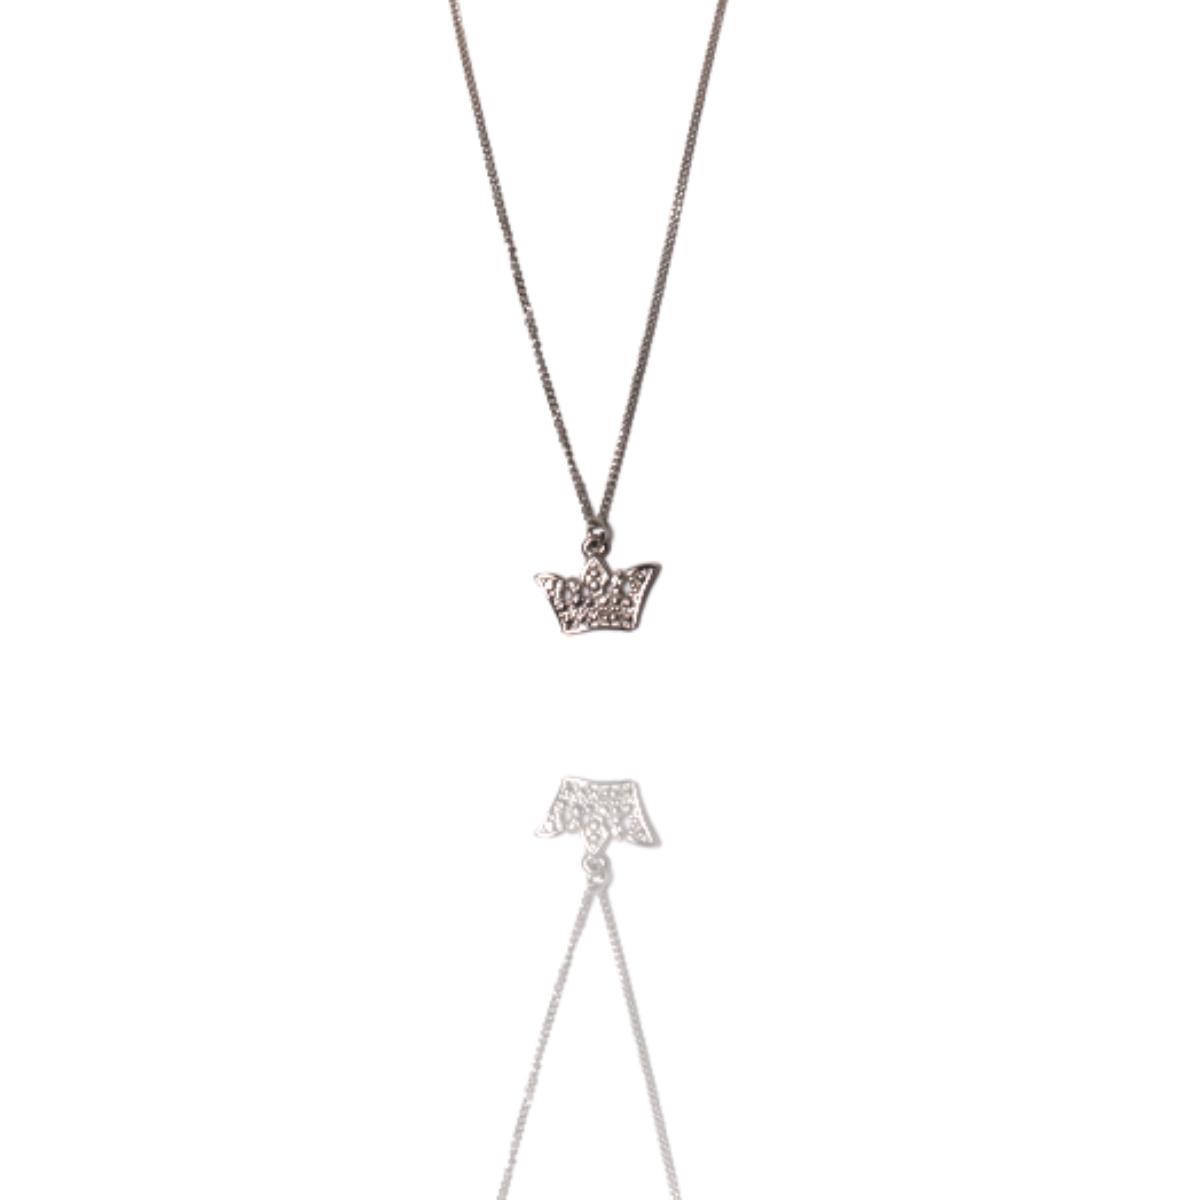 Colar Barbara Strauss Semi Joia Crown Em Metal, Revestido Em Ouro Branco 18K